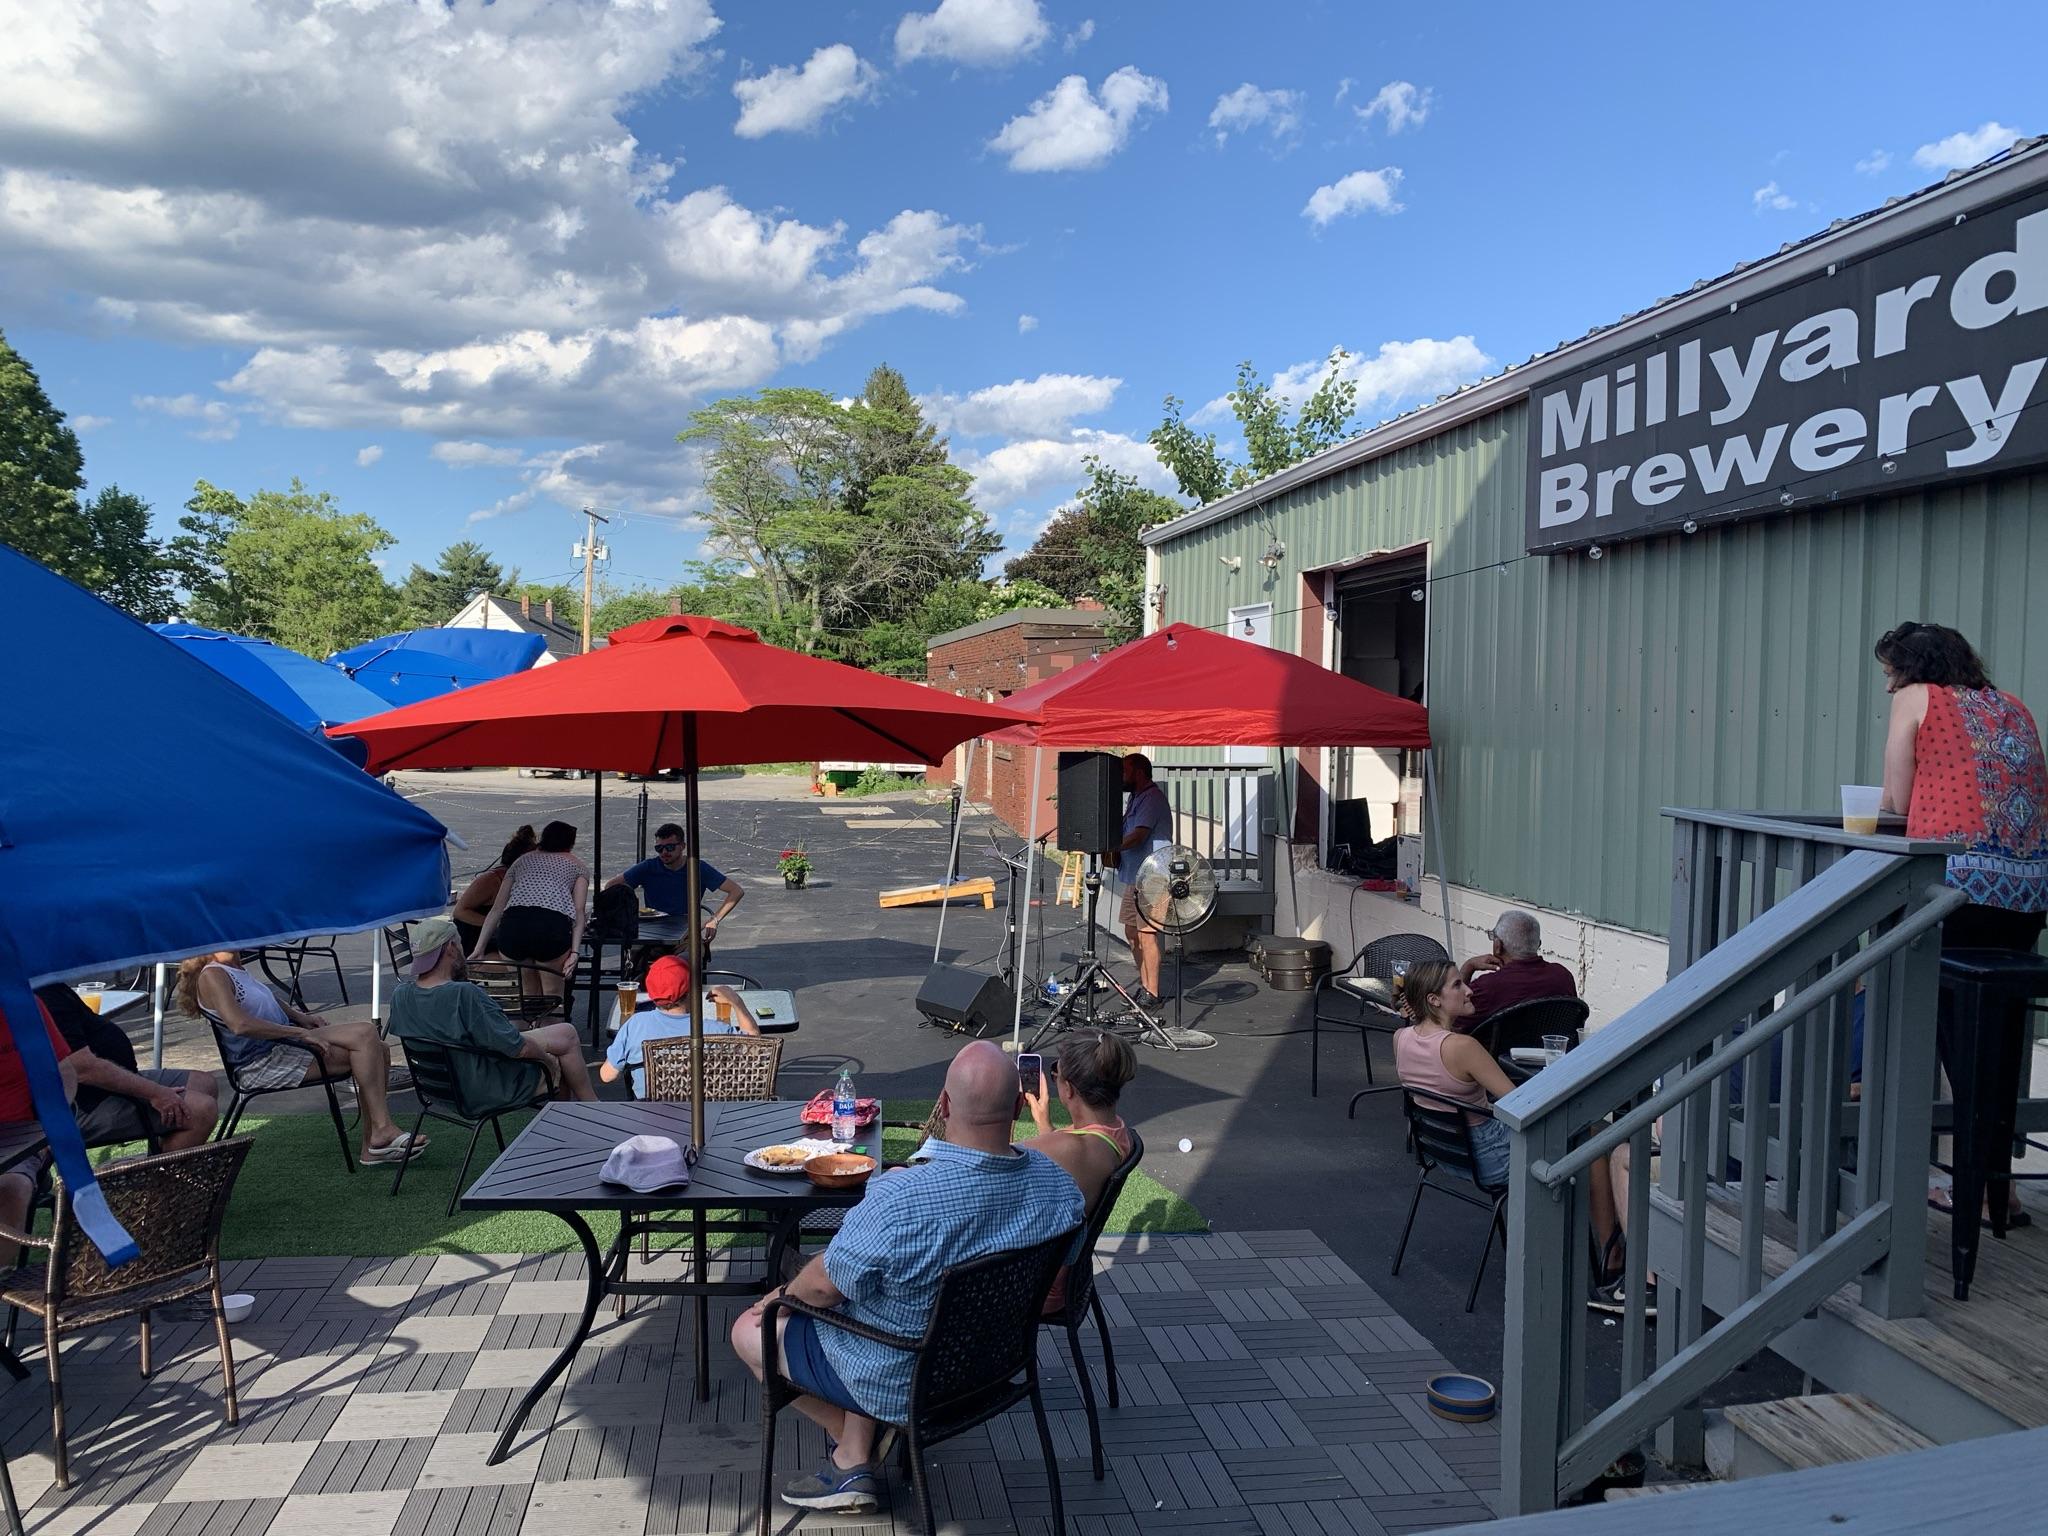 patio millyard brewery